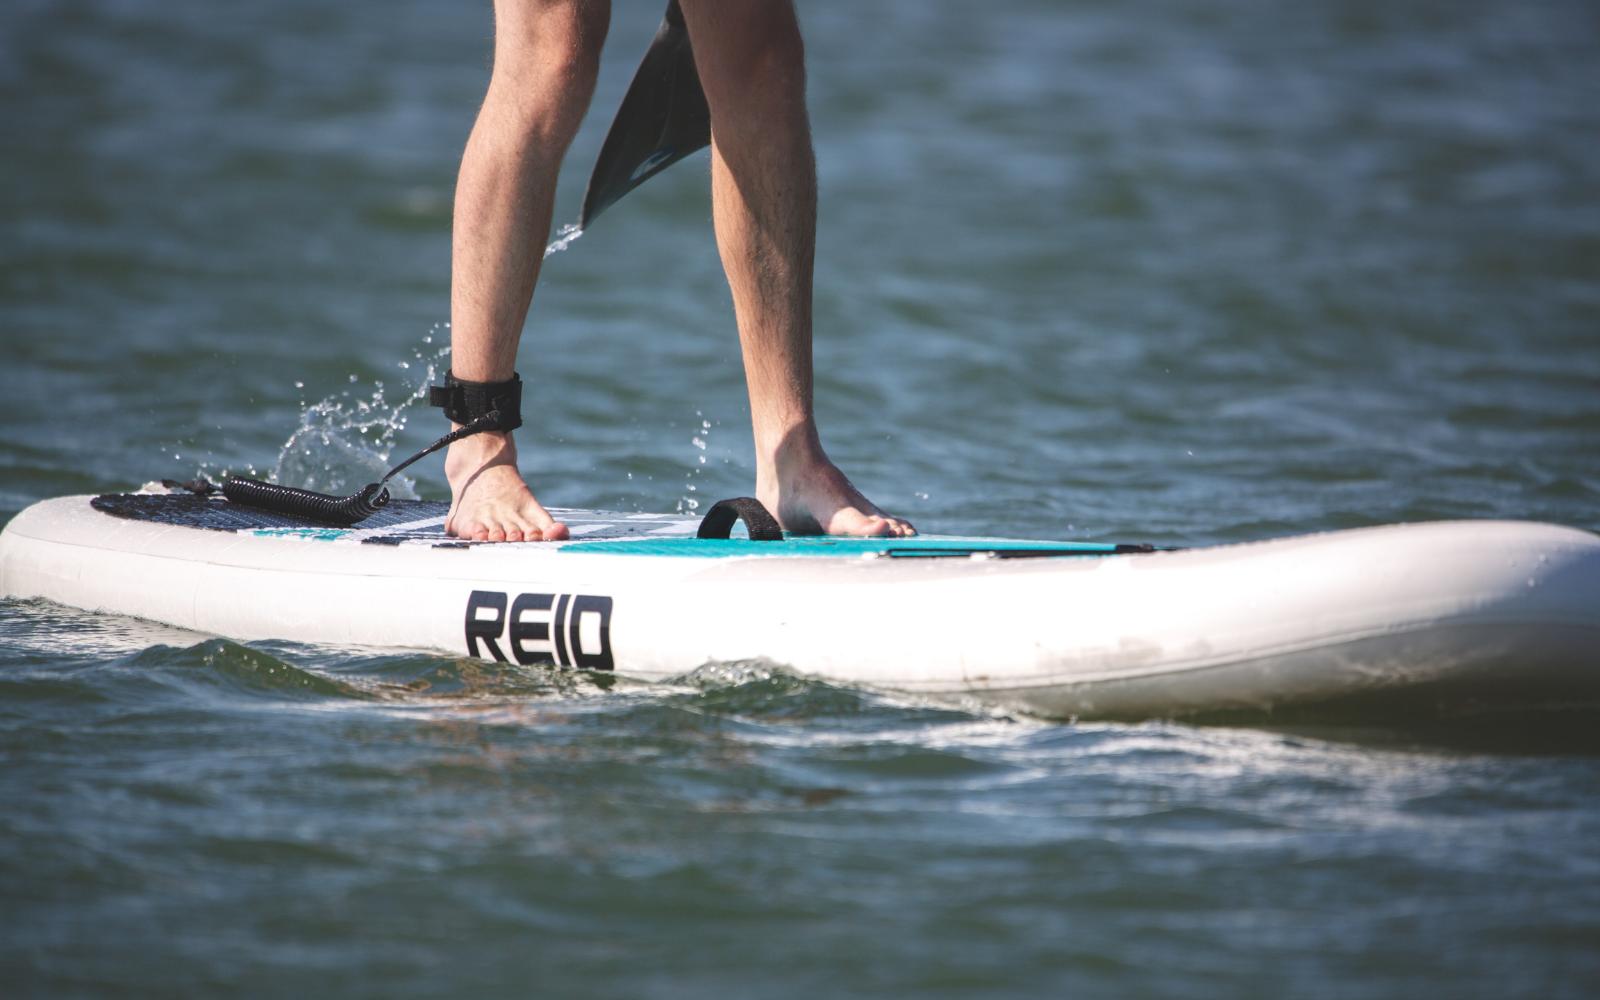 16 4 - Reid ® - Reid Waikiki 10'6 Paddleboard